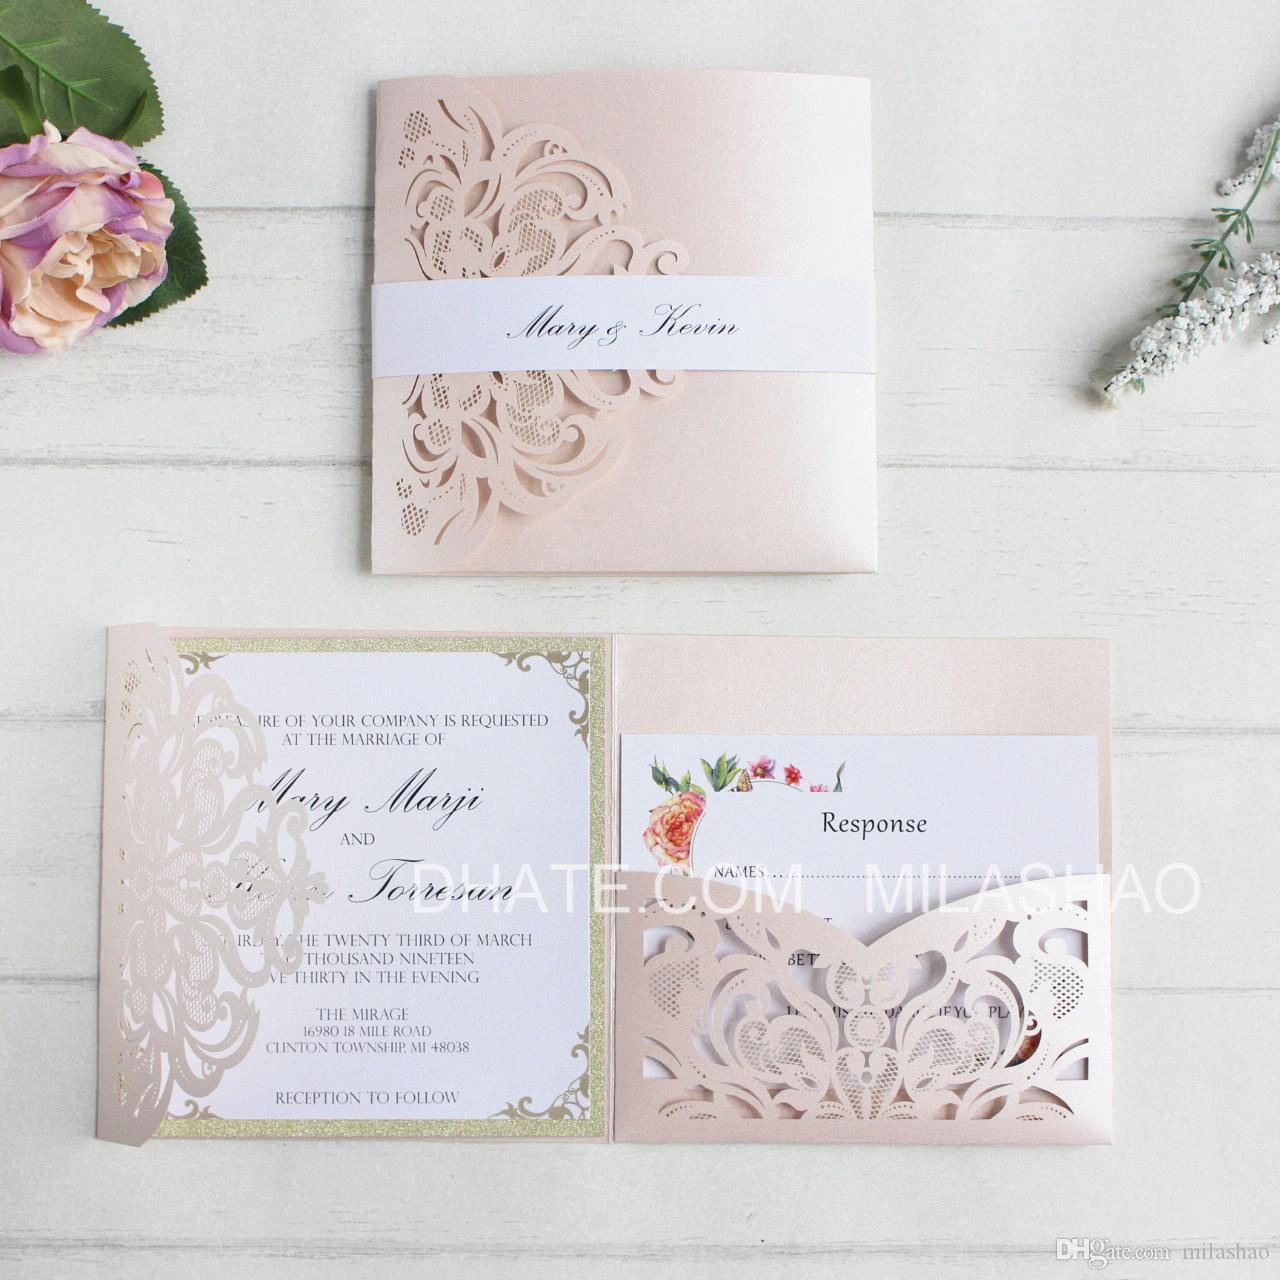 Flesh Pink Wedding Invitations Card Laser Pocket Bridal Marriage Invite Customized Printing Insert Belly Band Rsvp Elegant Make Your Own: Pink And Burgundy Wedding Invitations At Websimilar.org